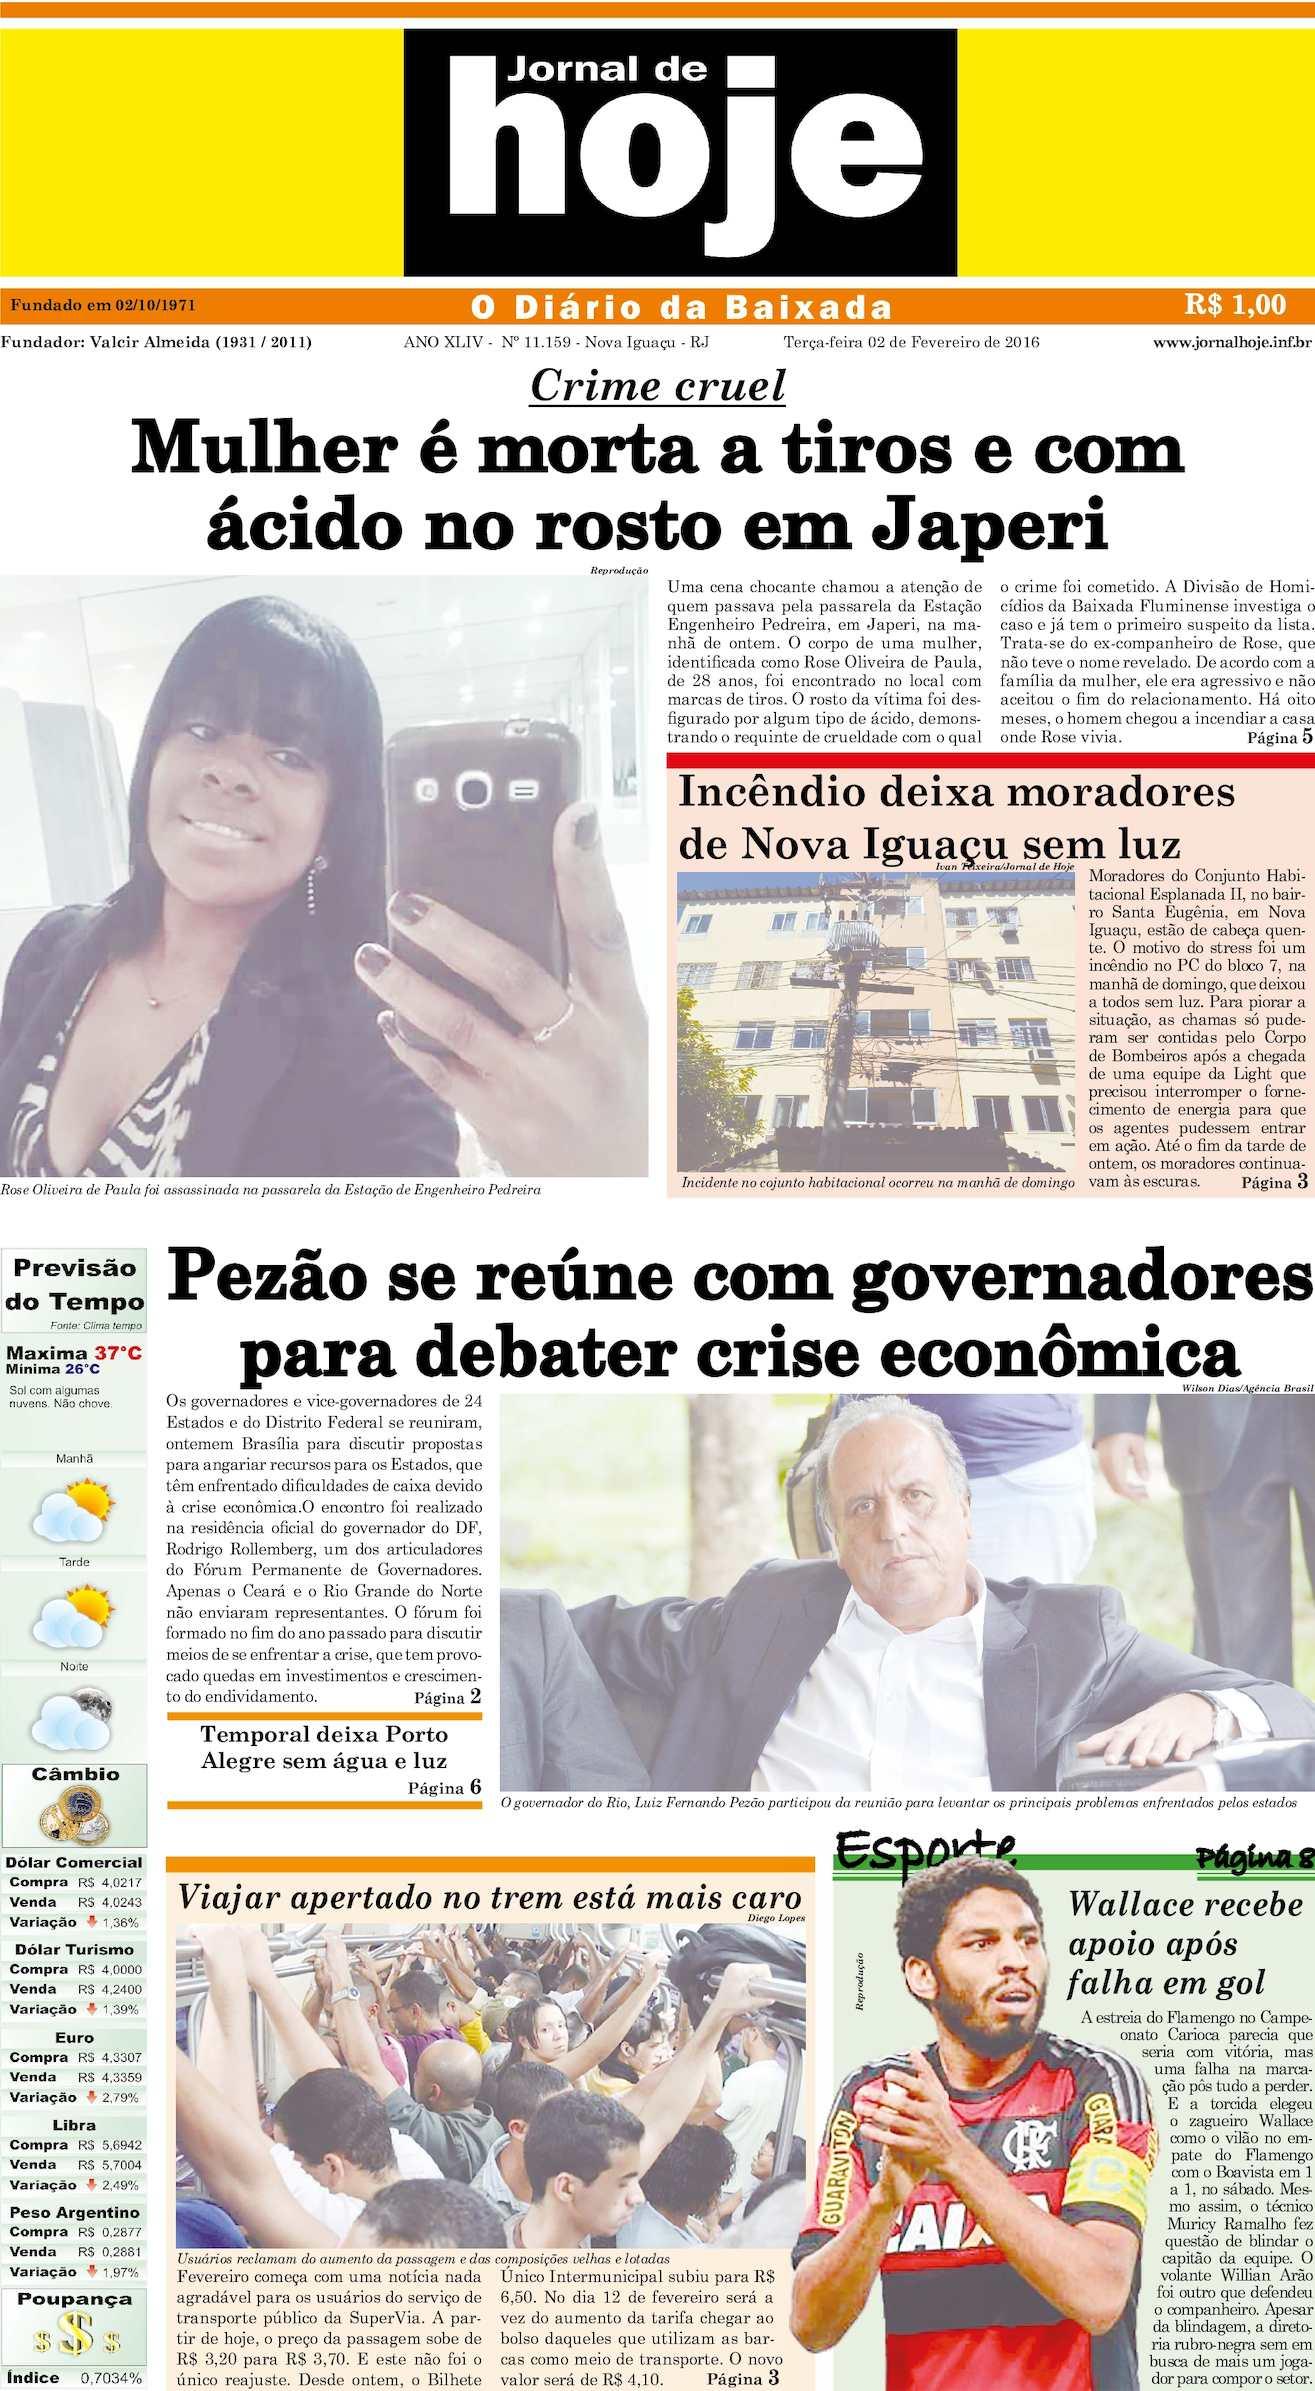 57977d8061 Calaméo - Jornal De Hoje 020216